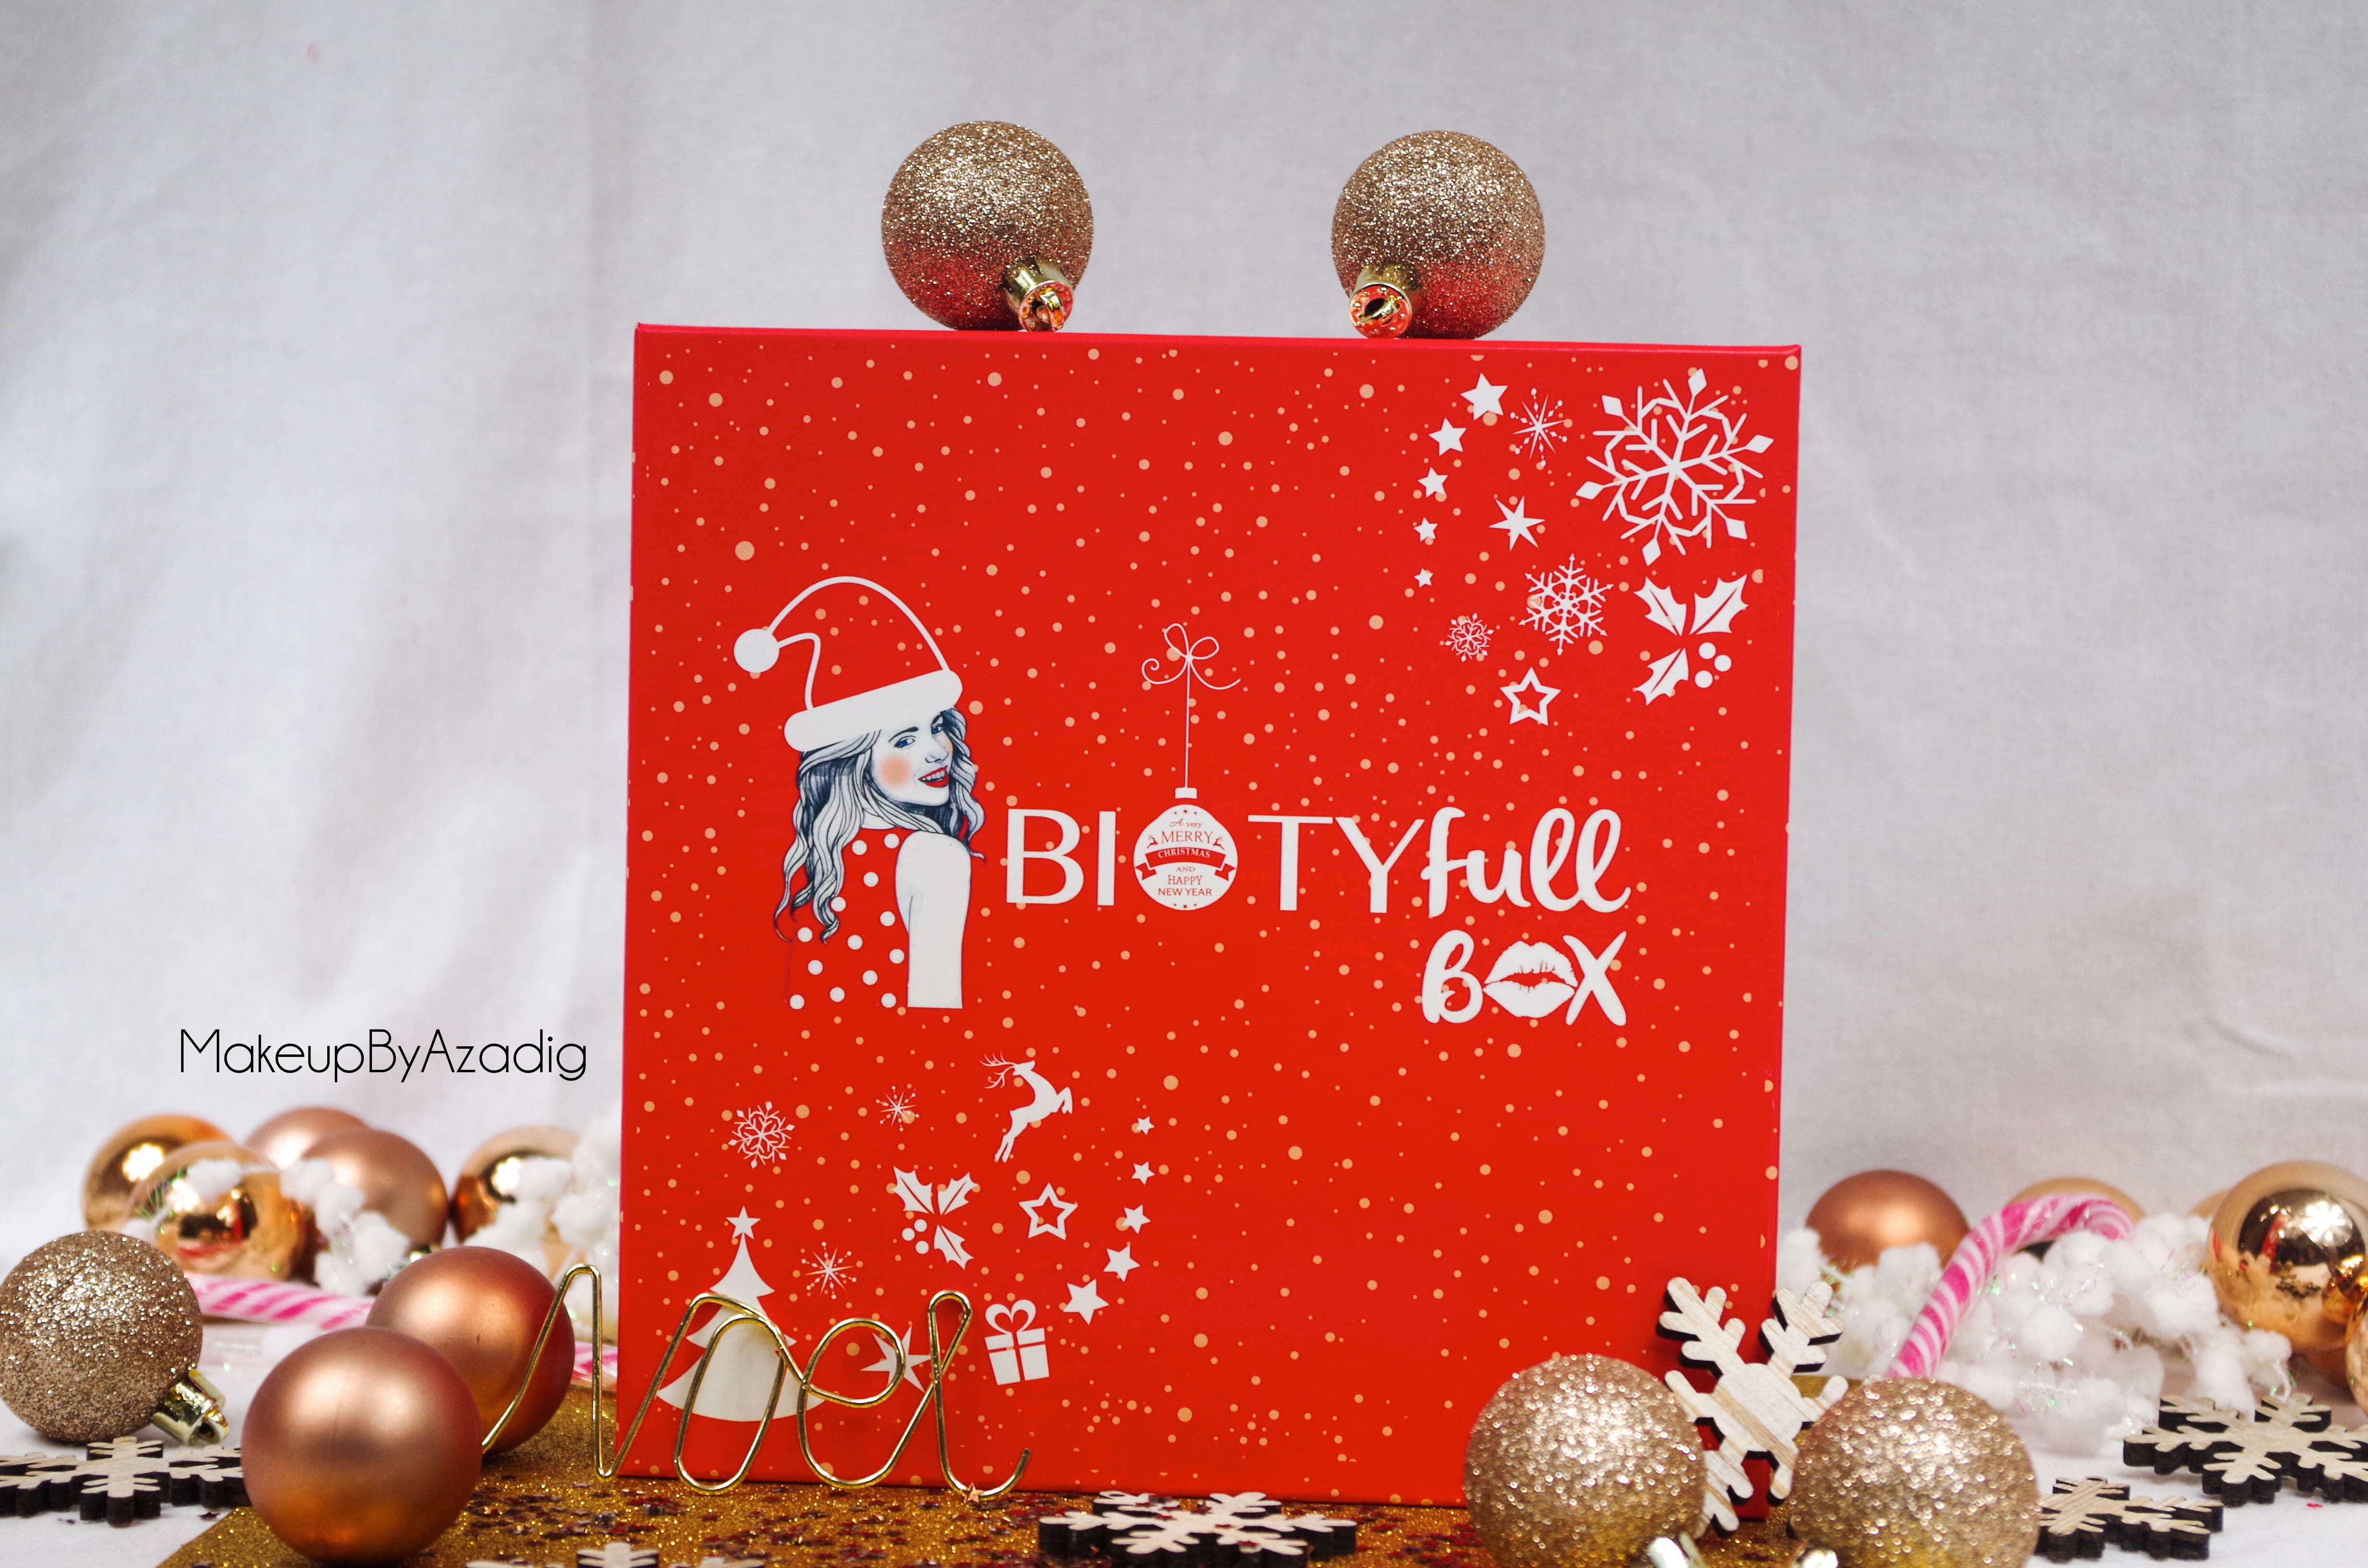 biotyfull-box-beaute-makeupbyazadig-revue-avis-prix-troyes-paris-produits-bio-edition